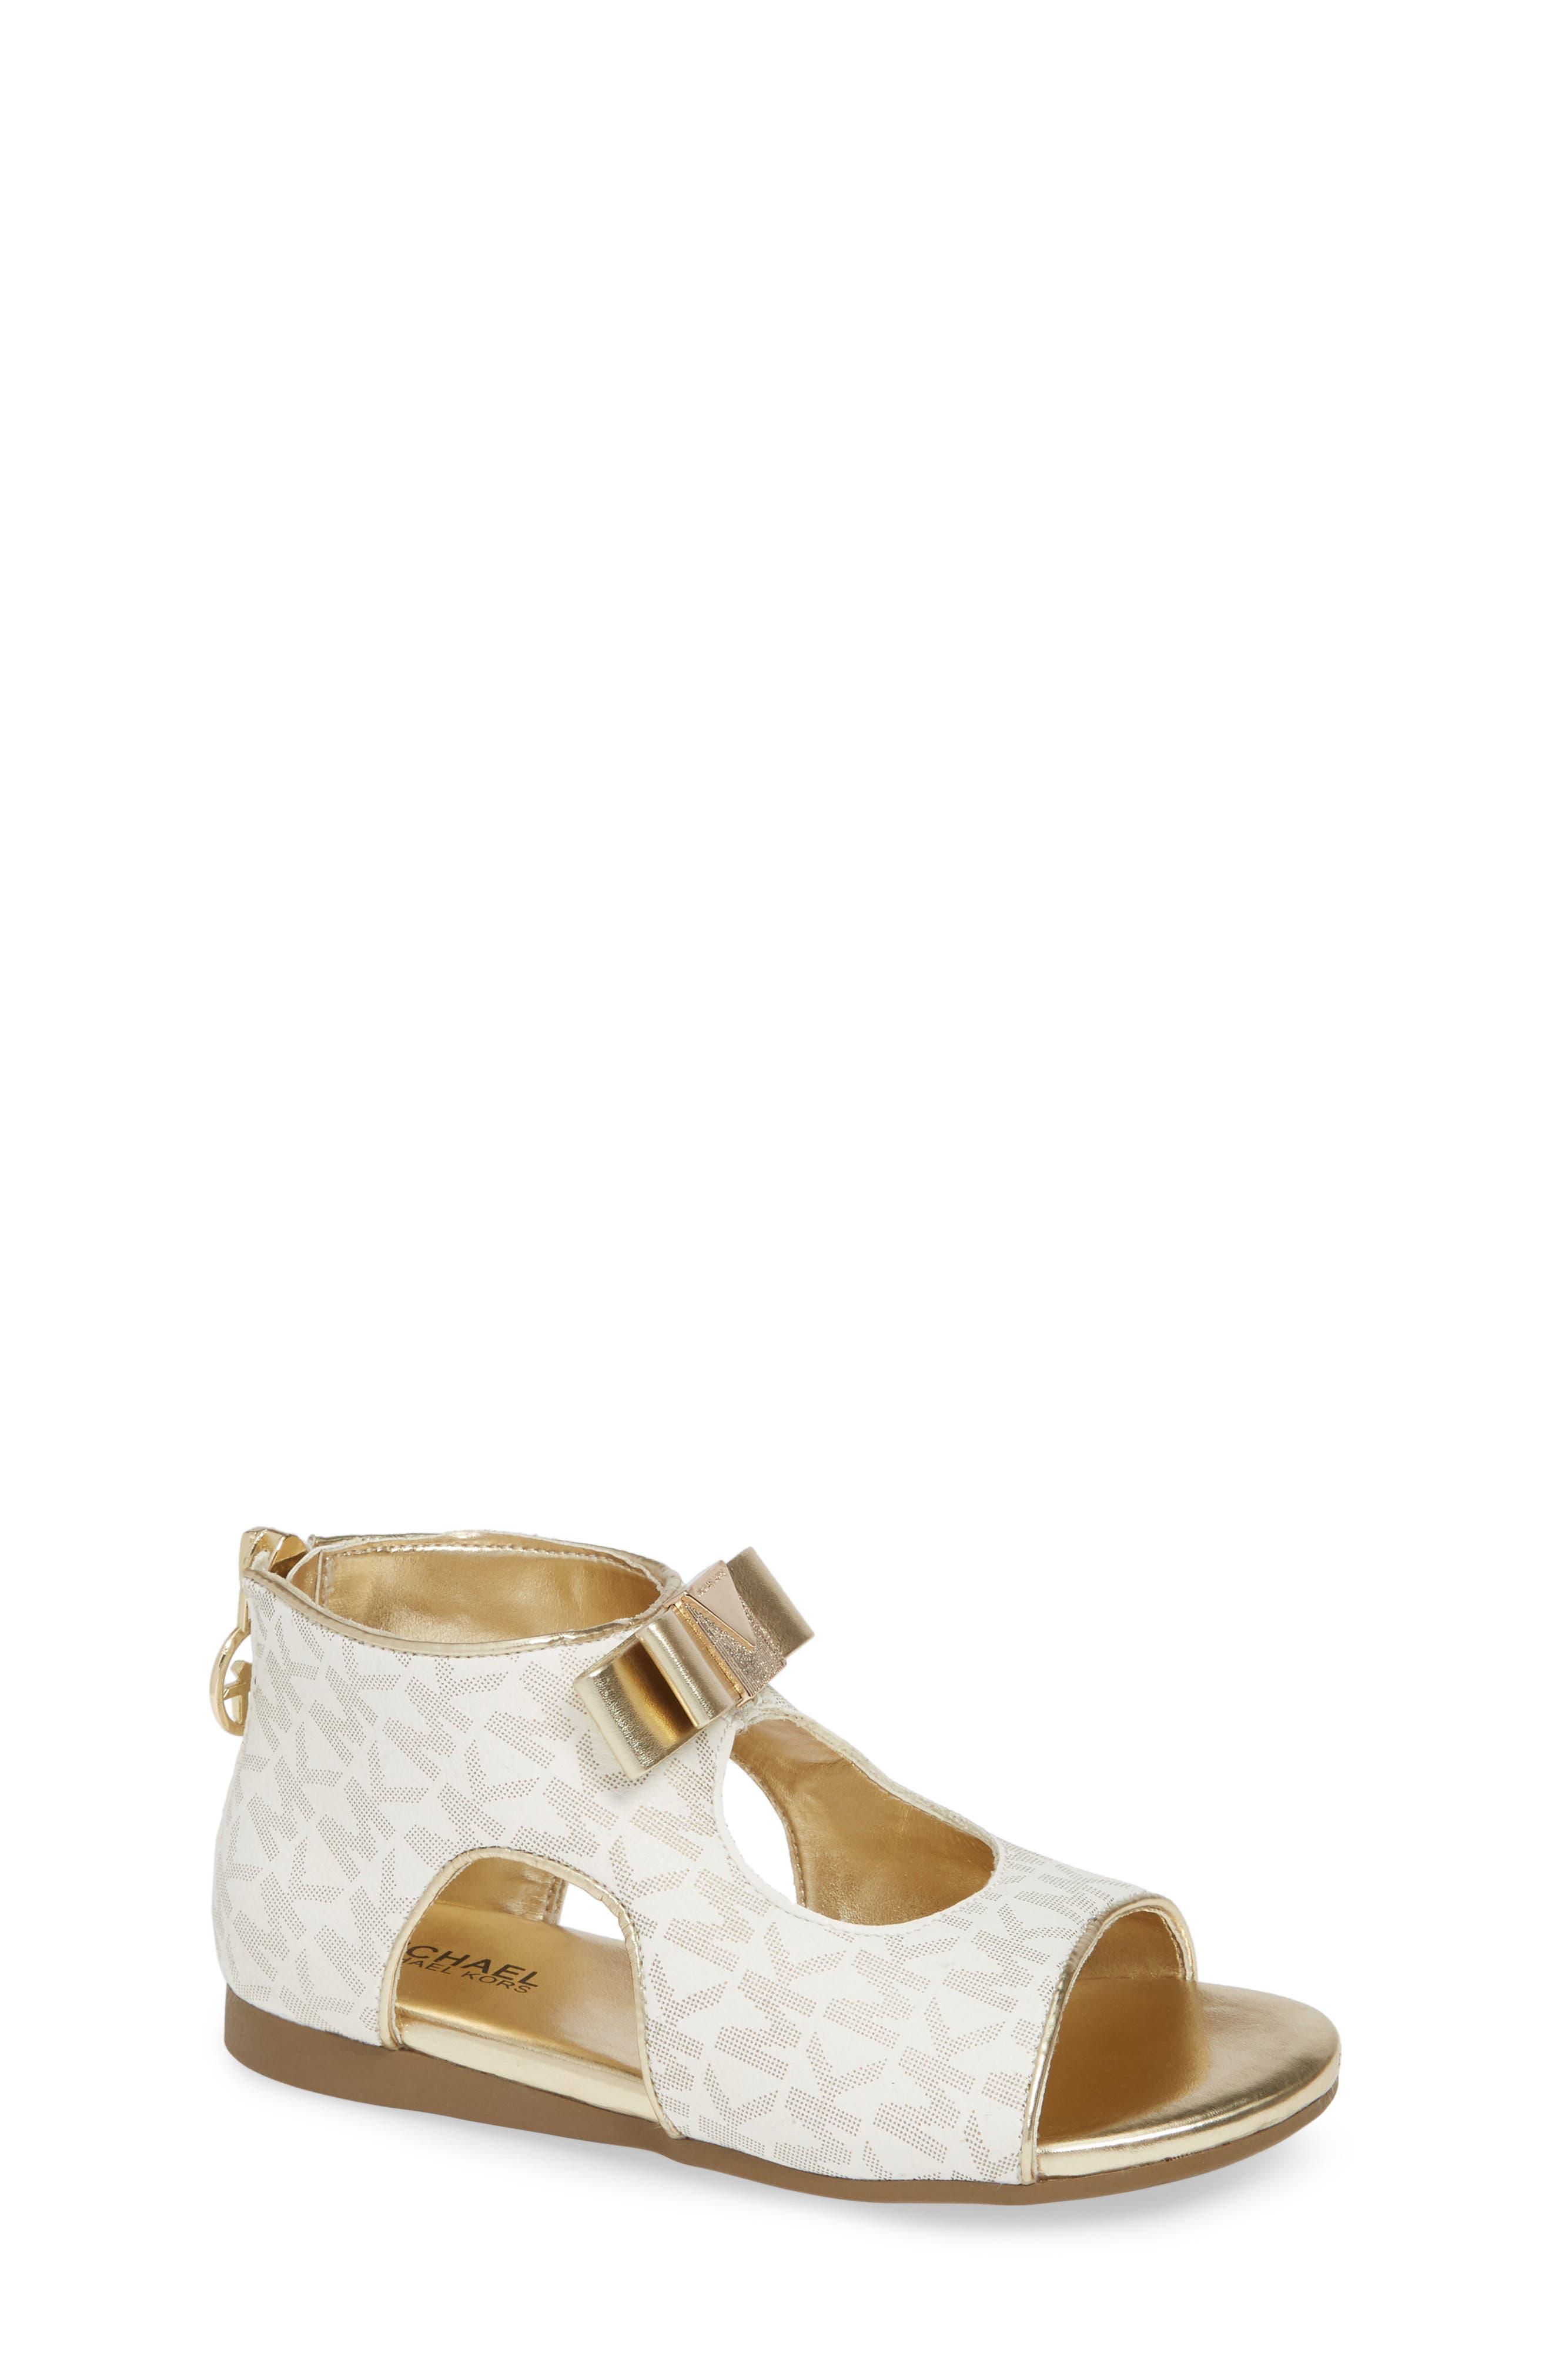 Tilly Dahna Logo Sandal,                             Main thumbnail 1, color,                             GOLD/ WHITE